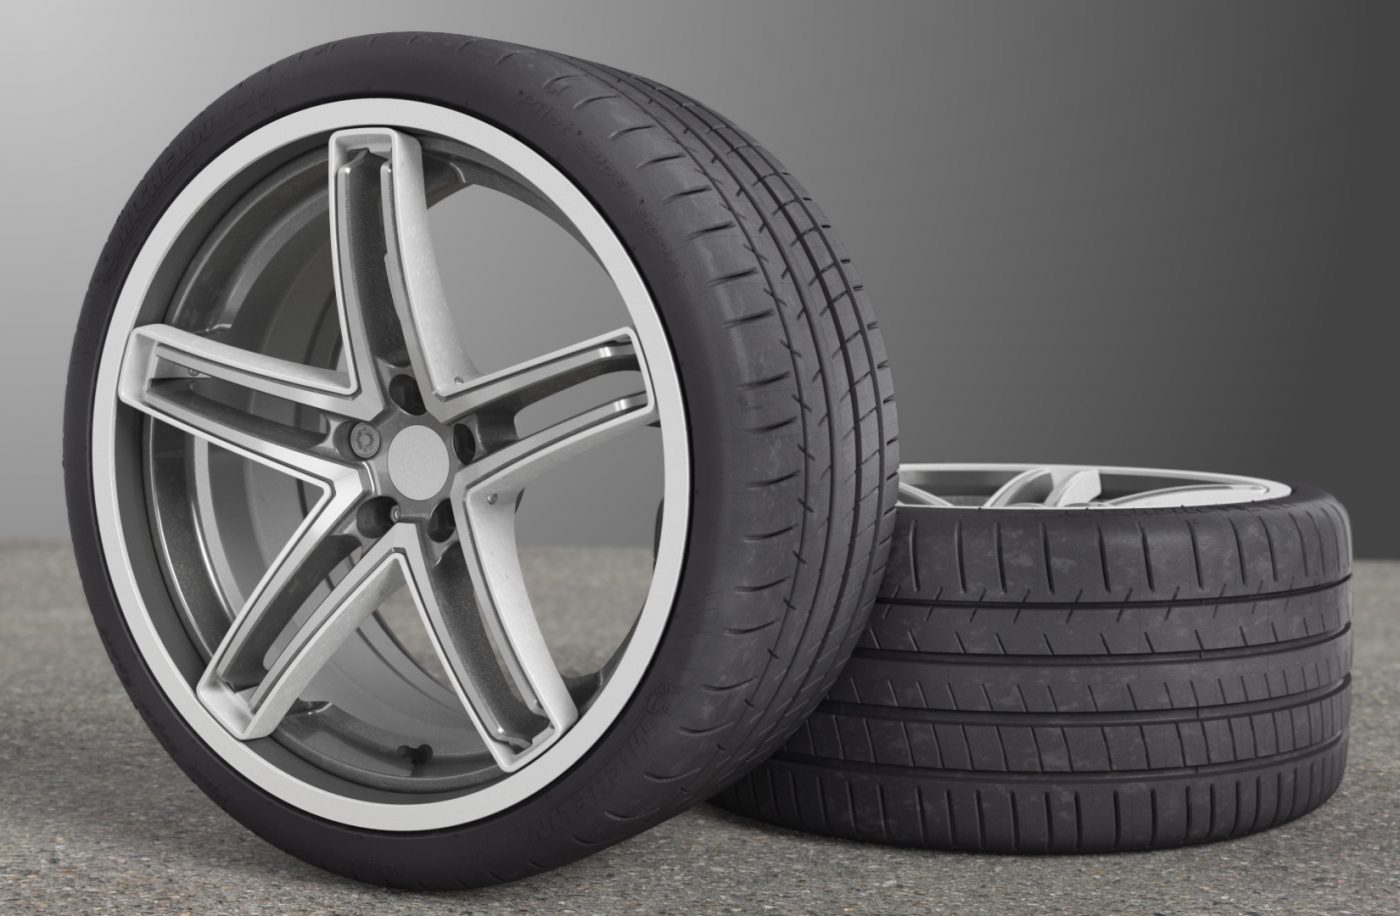 Maxion_Flexible_Wheel_Product_2_Wheels